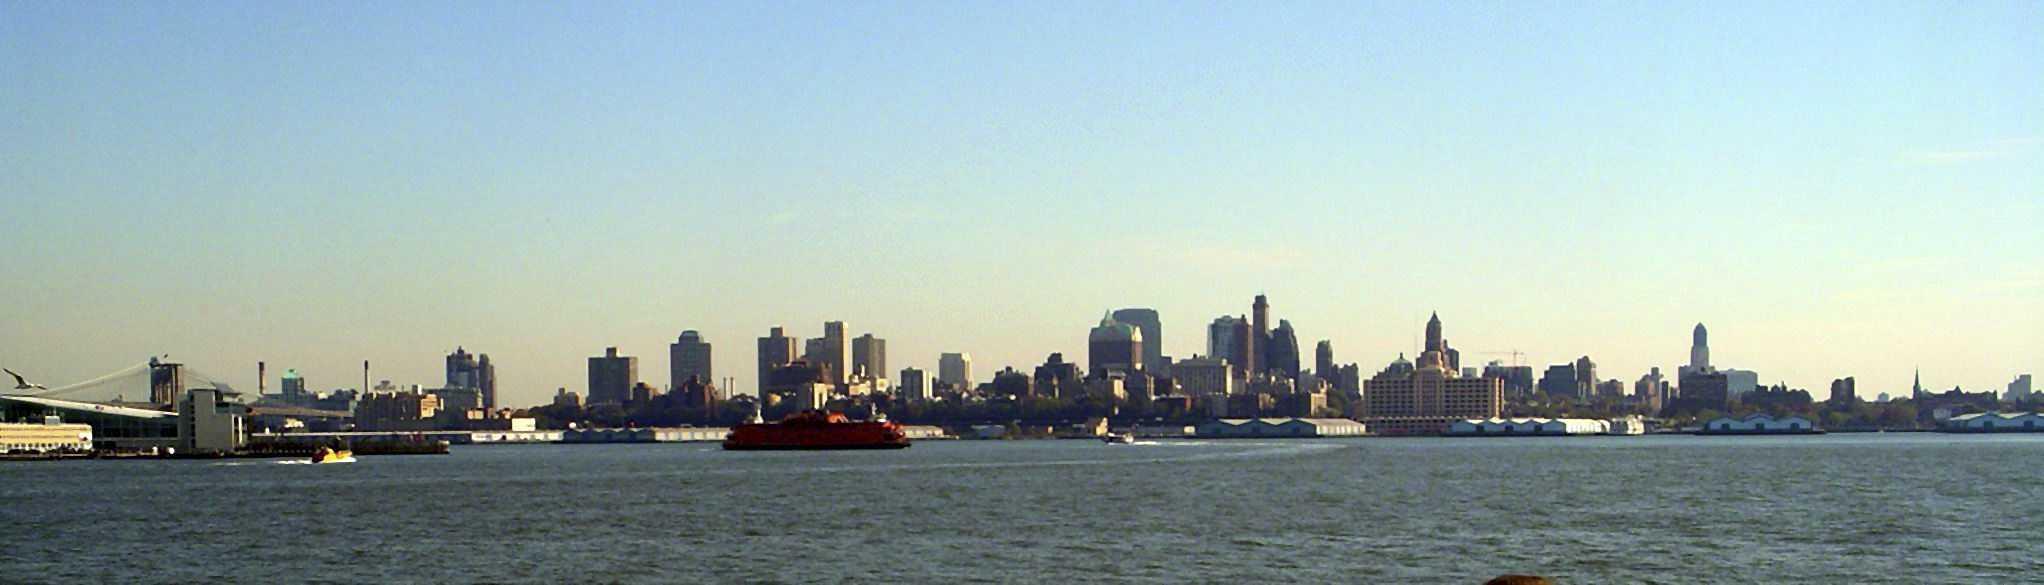 brooklyn-skyline-1446735 קו הרקיע של ברוקלין